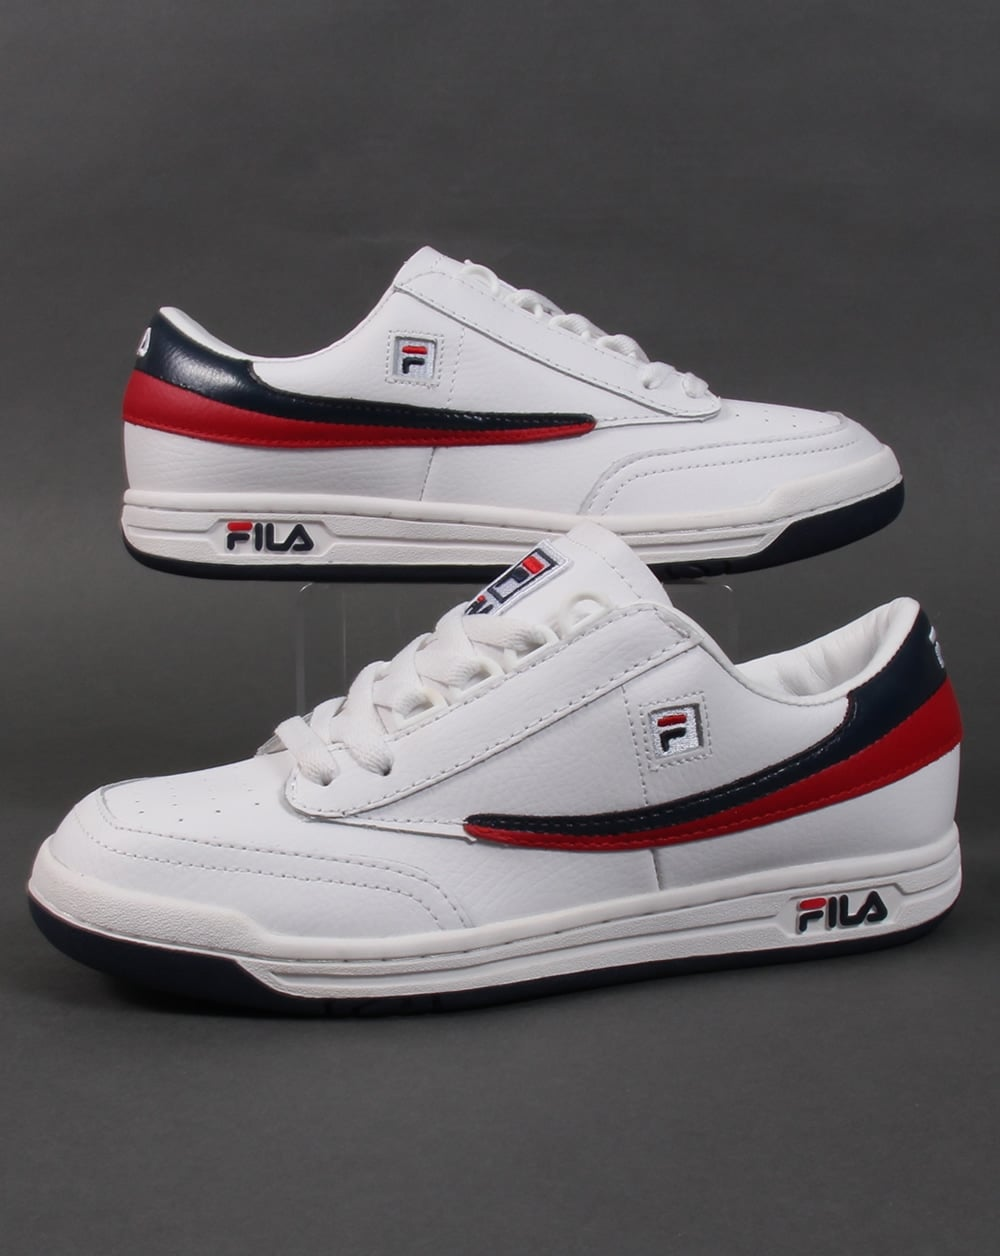 Fila Original Trainers Whitenavyred Tennis Heritage fybg7Y6